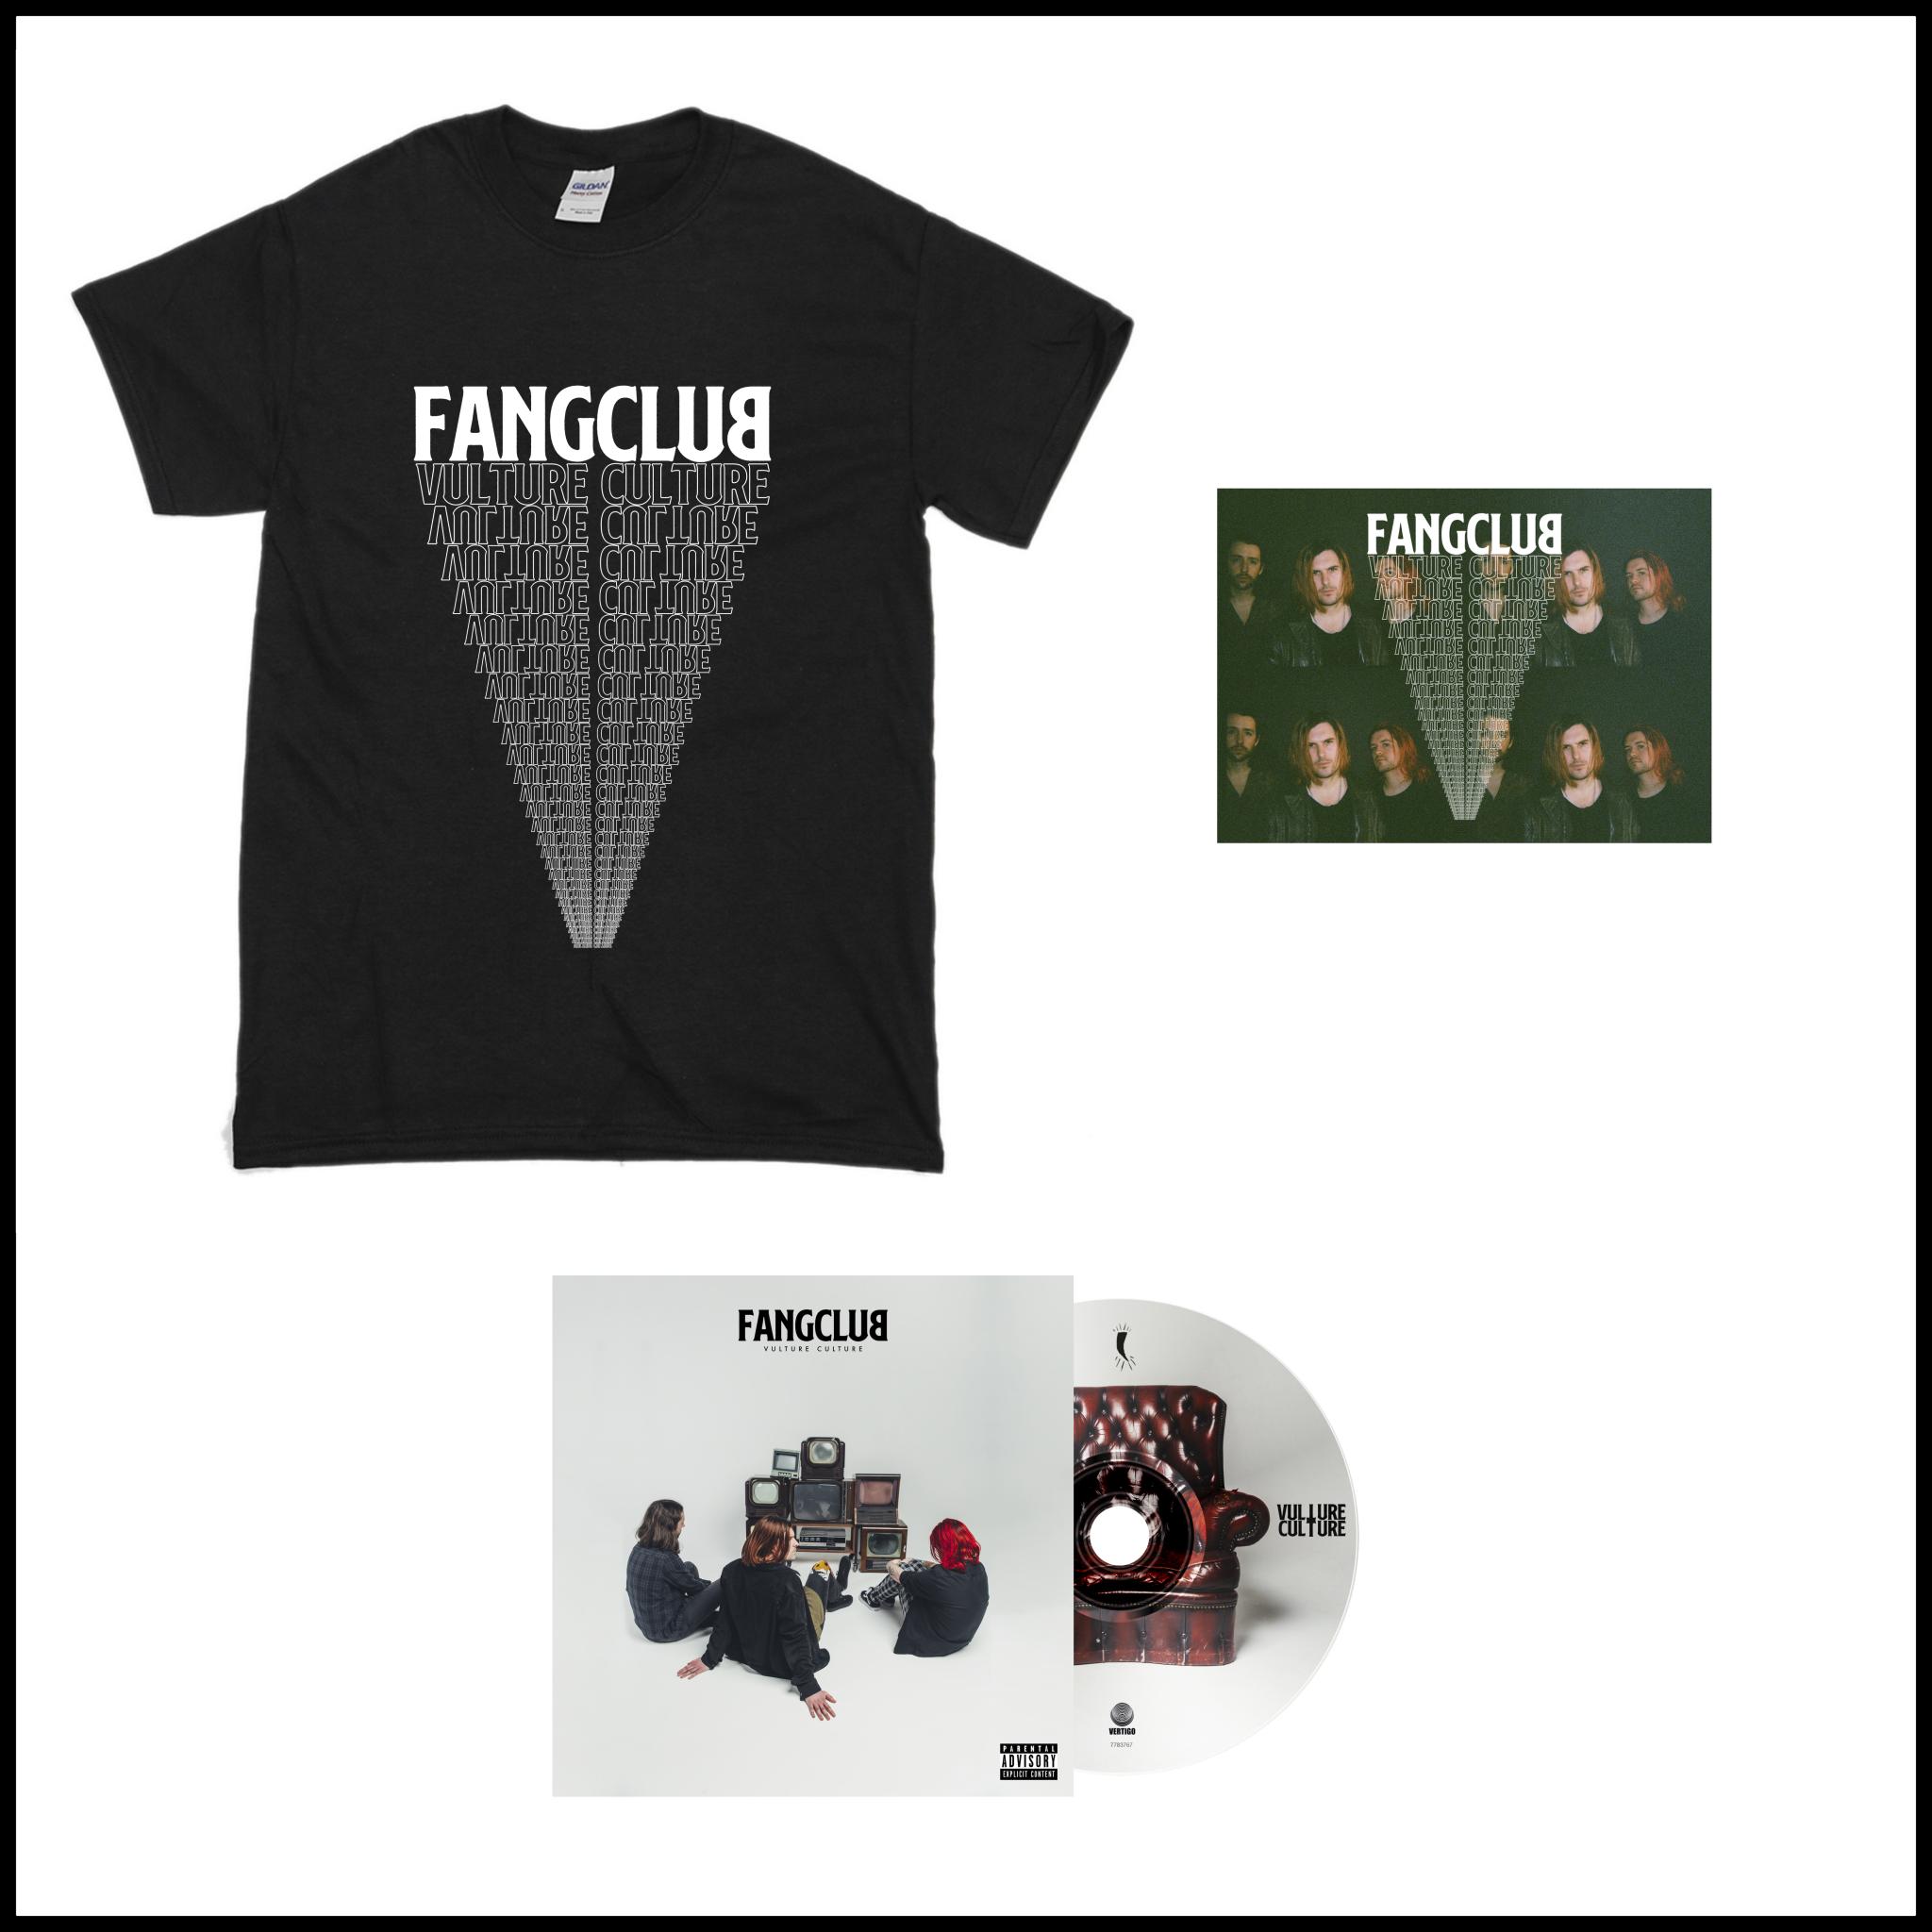 Fangclub: CD Bundle